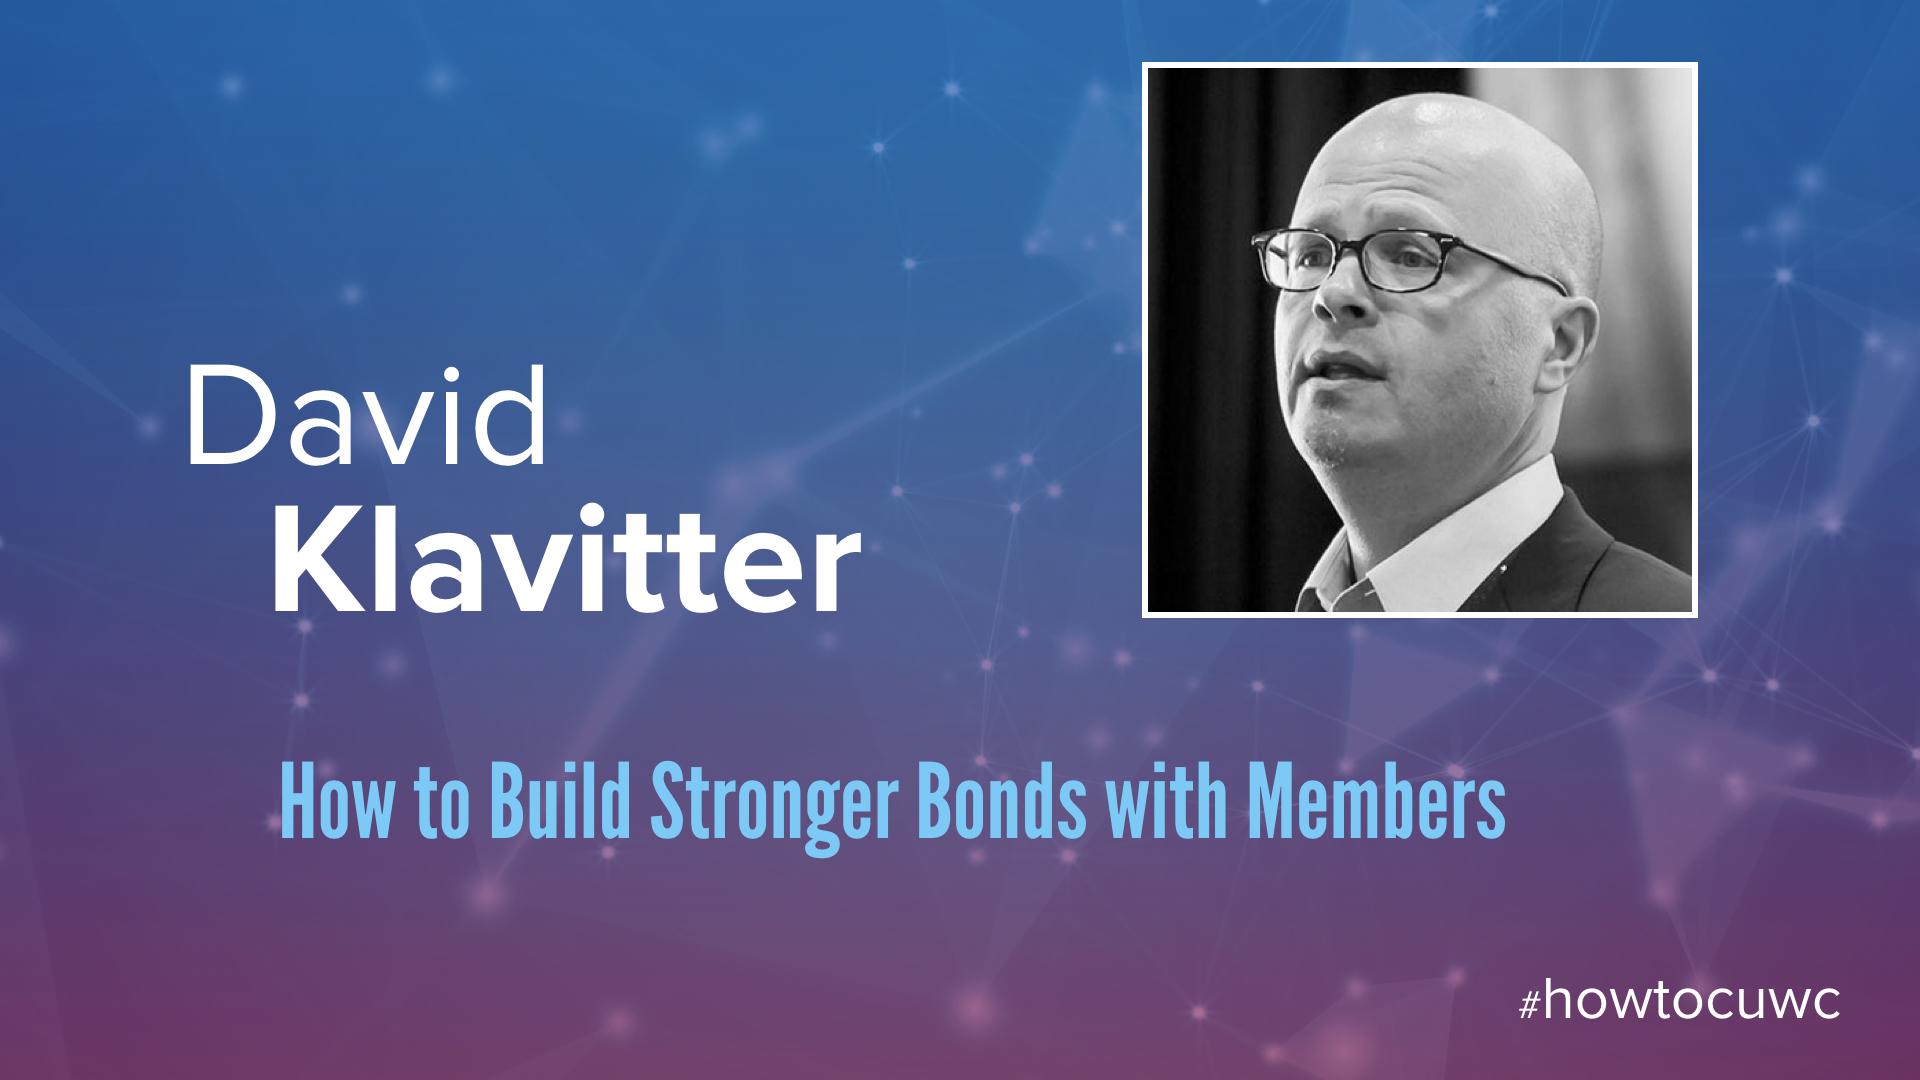 David Klavitter